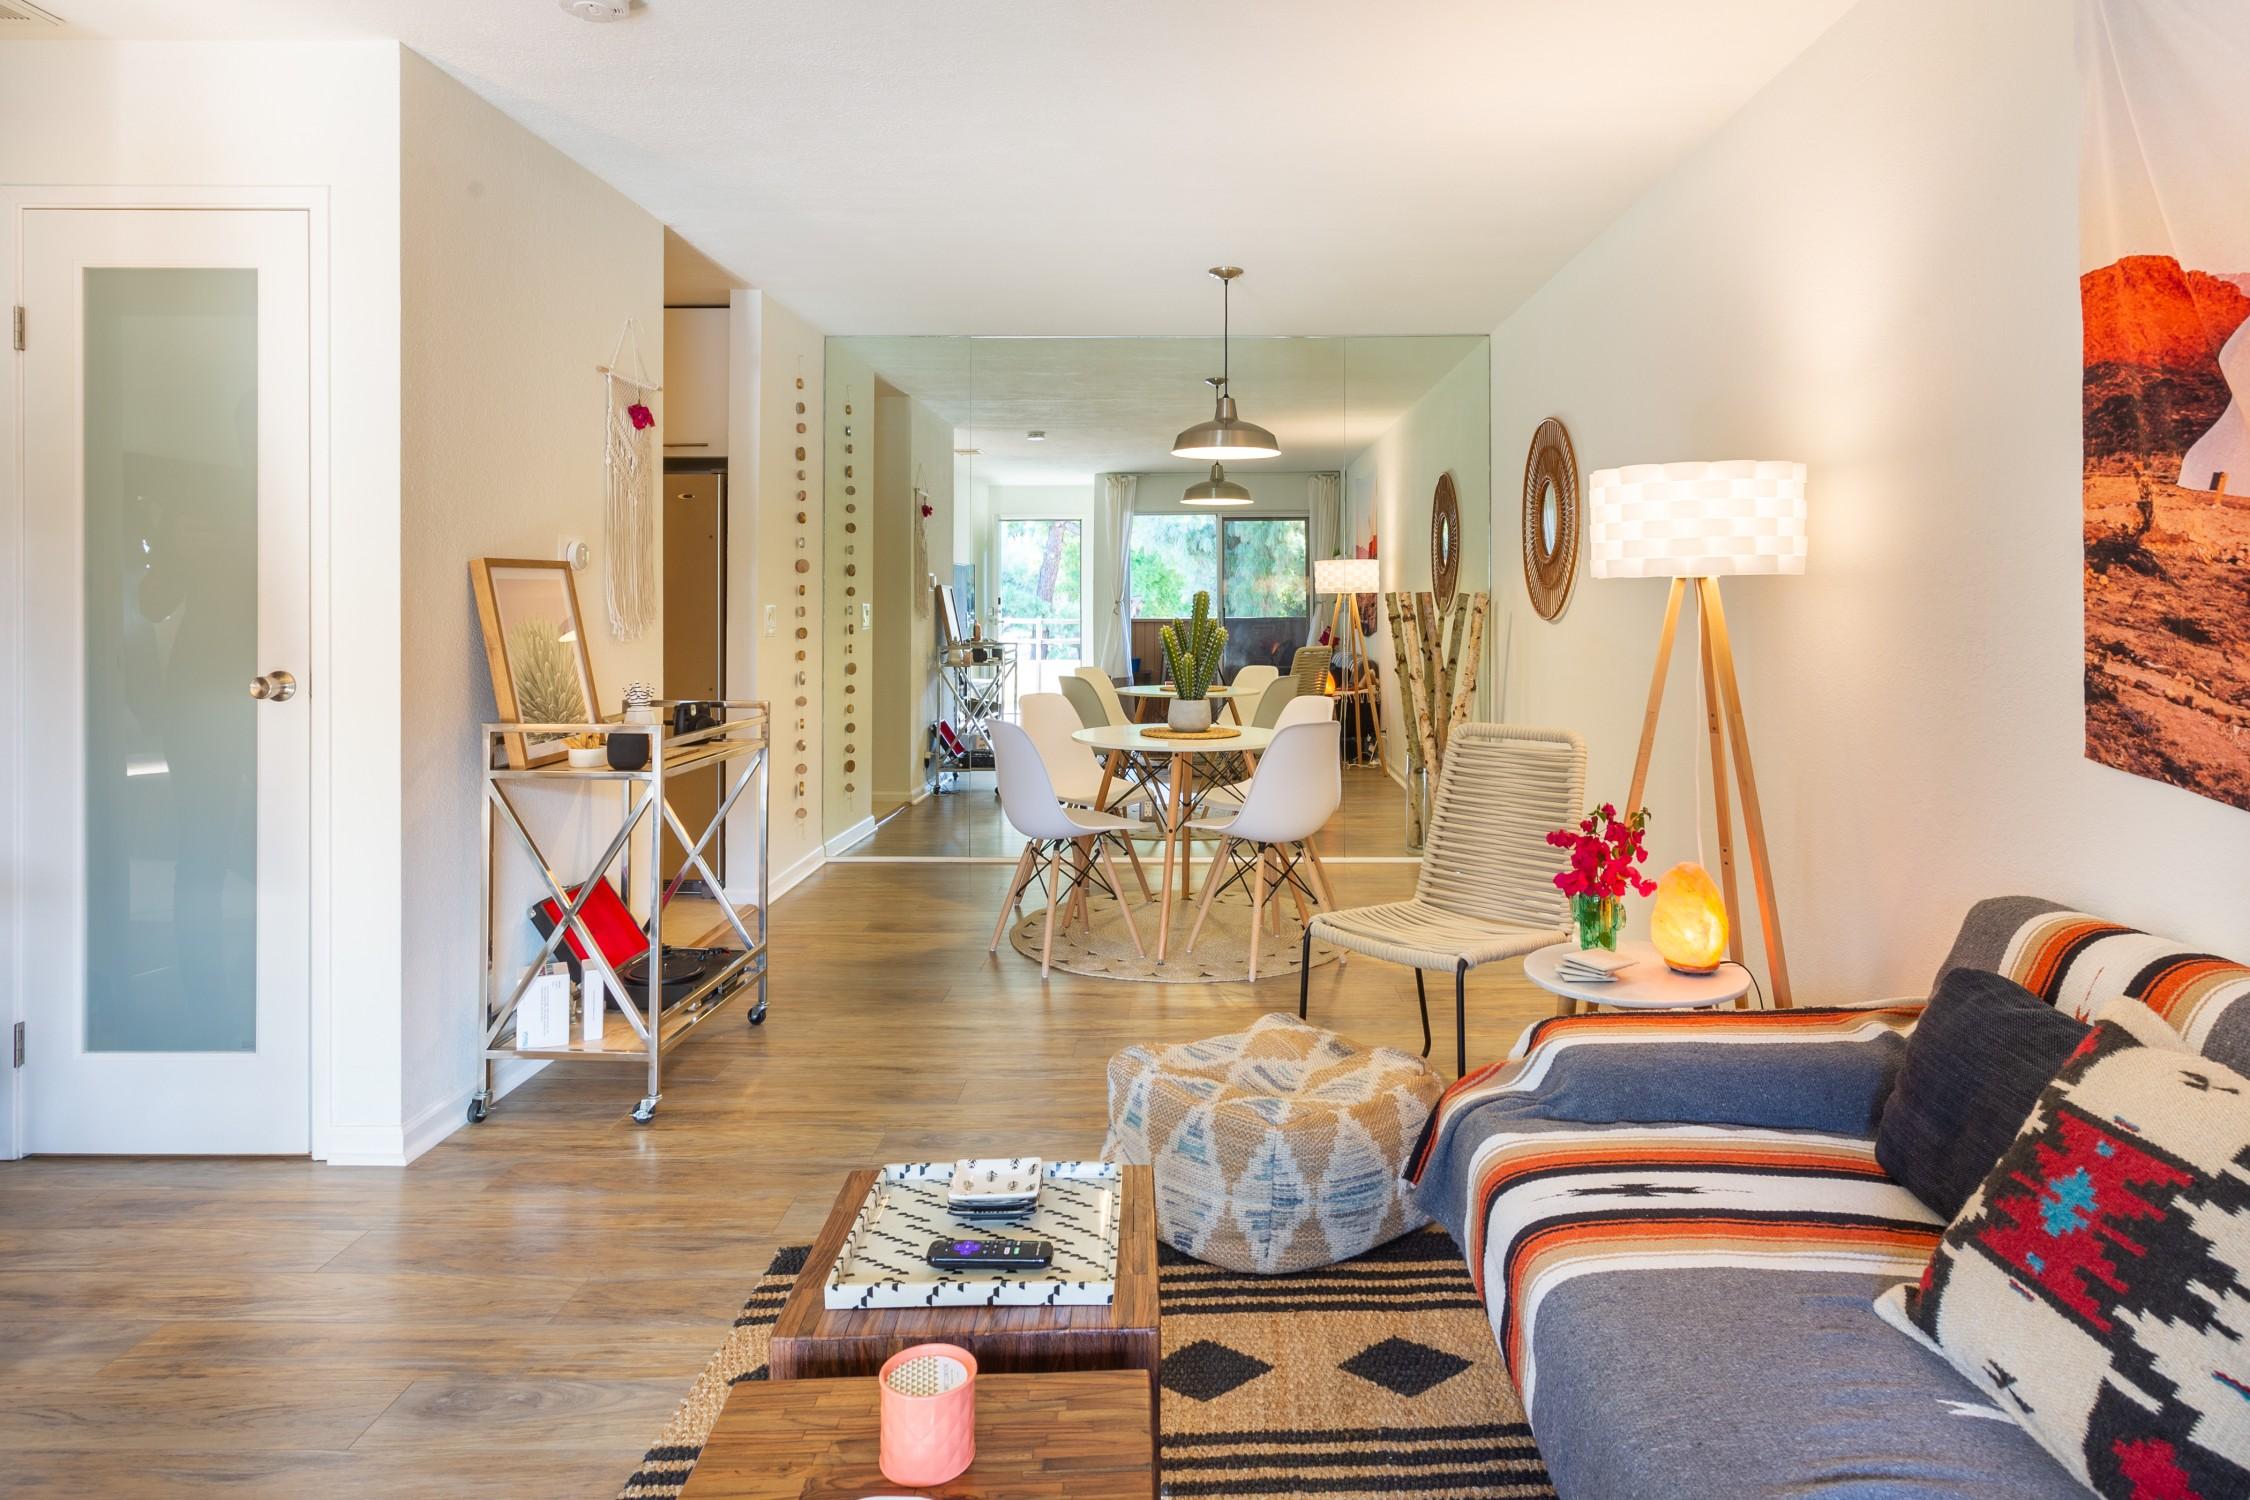 Condo Airbnb Palm Springs 2020